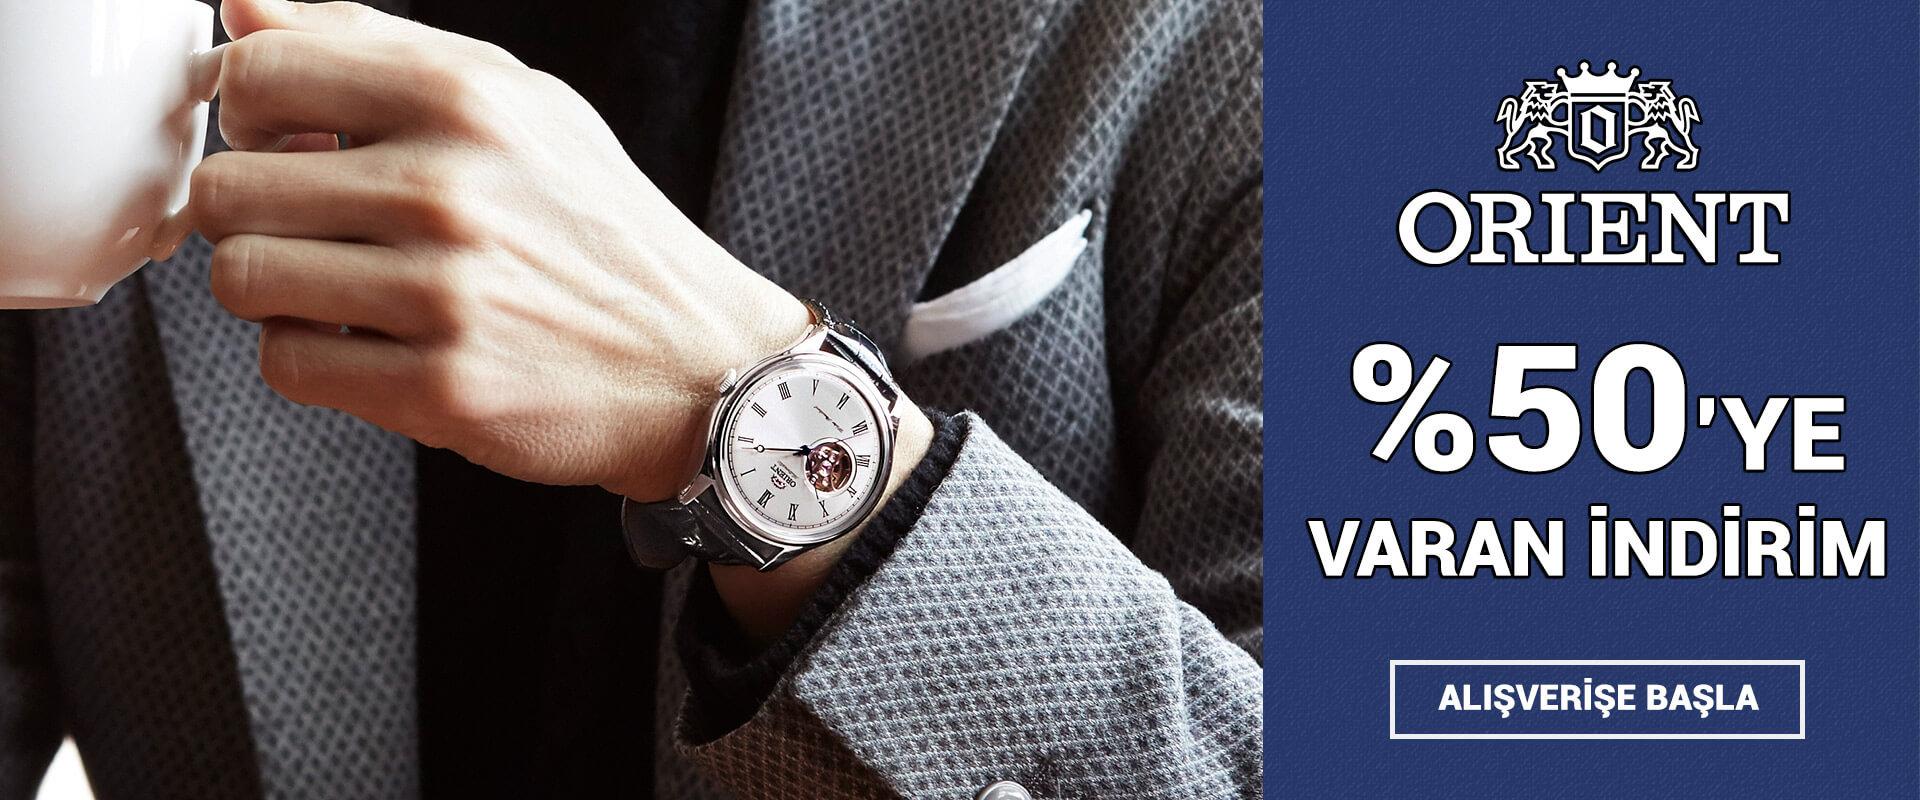 Orient Saat Modelleri %50'ye Varan İndirim